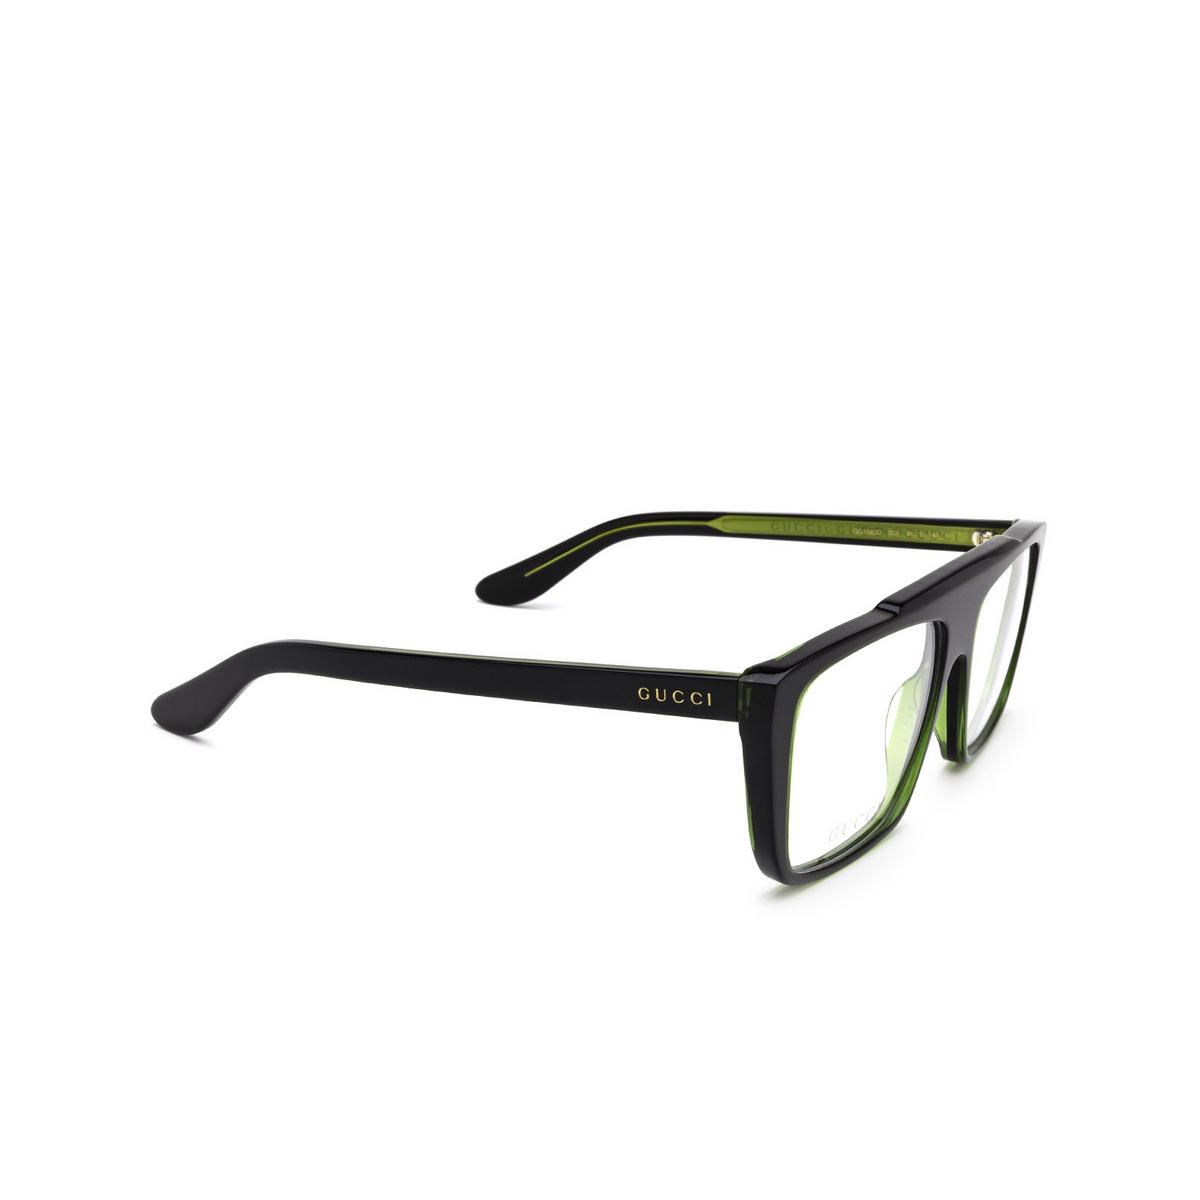 Gucci® Square Eyeglasses: GG1040O color Green & Black 003 - three-quarters view.